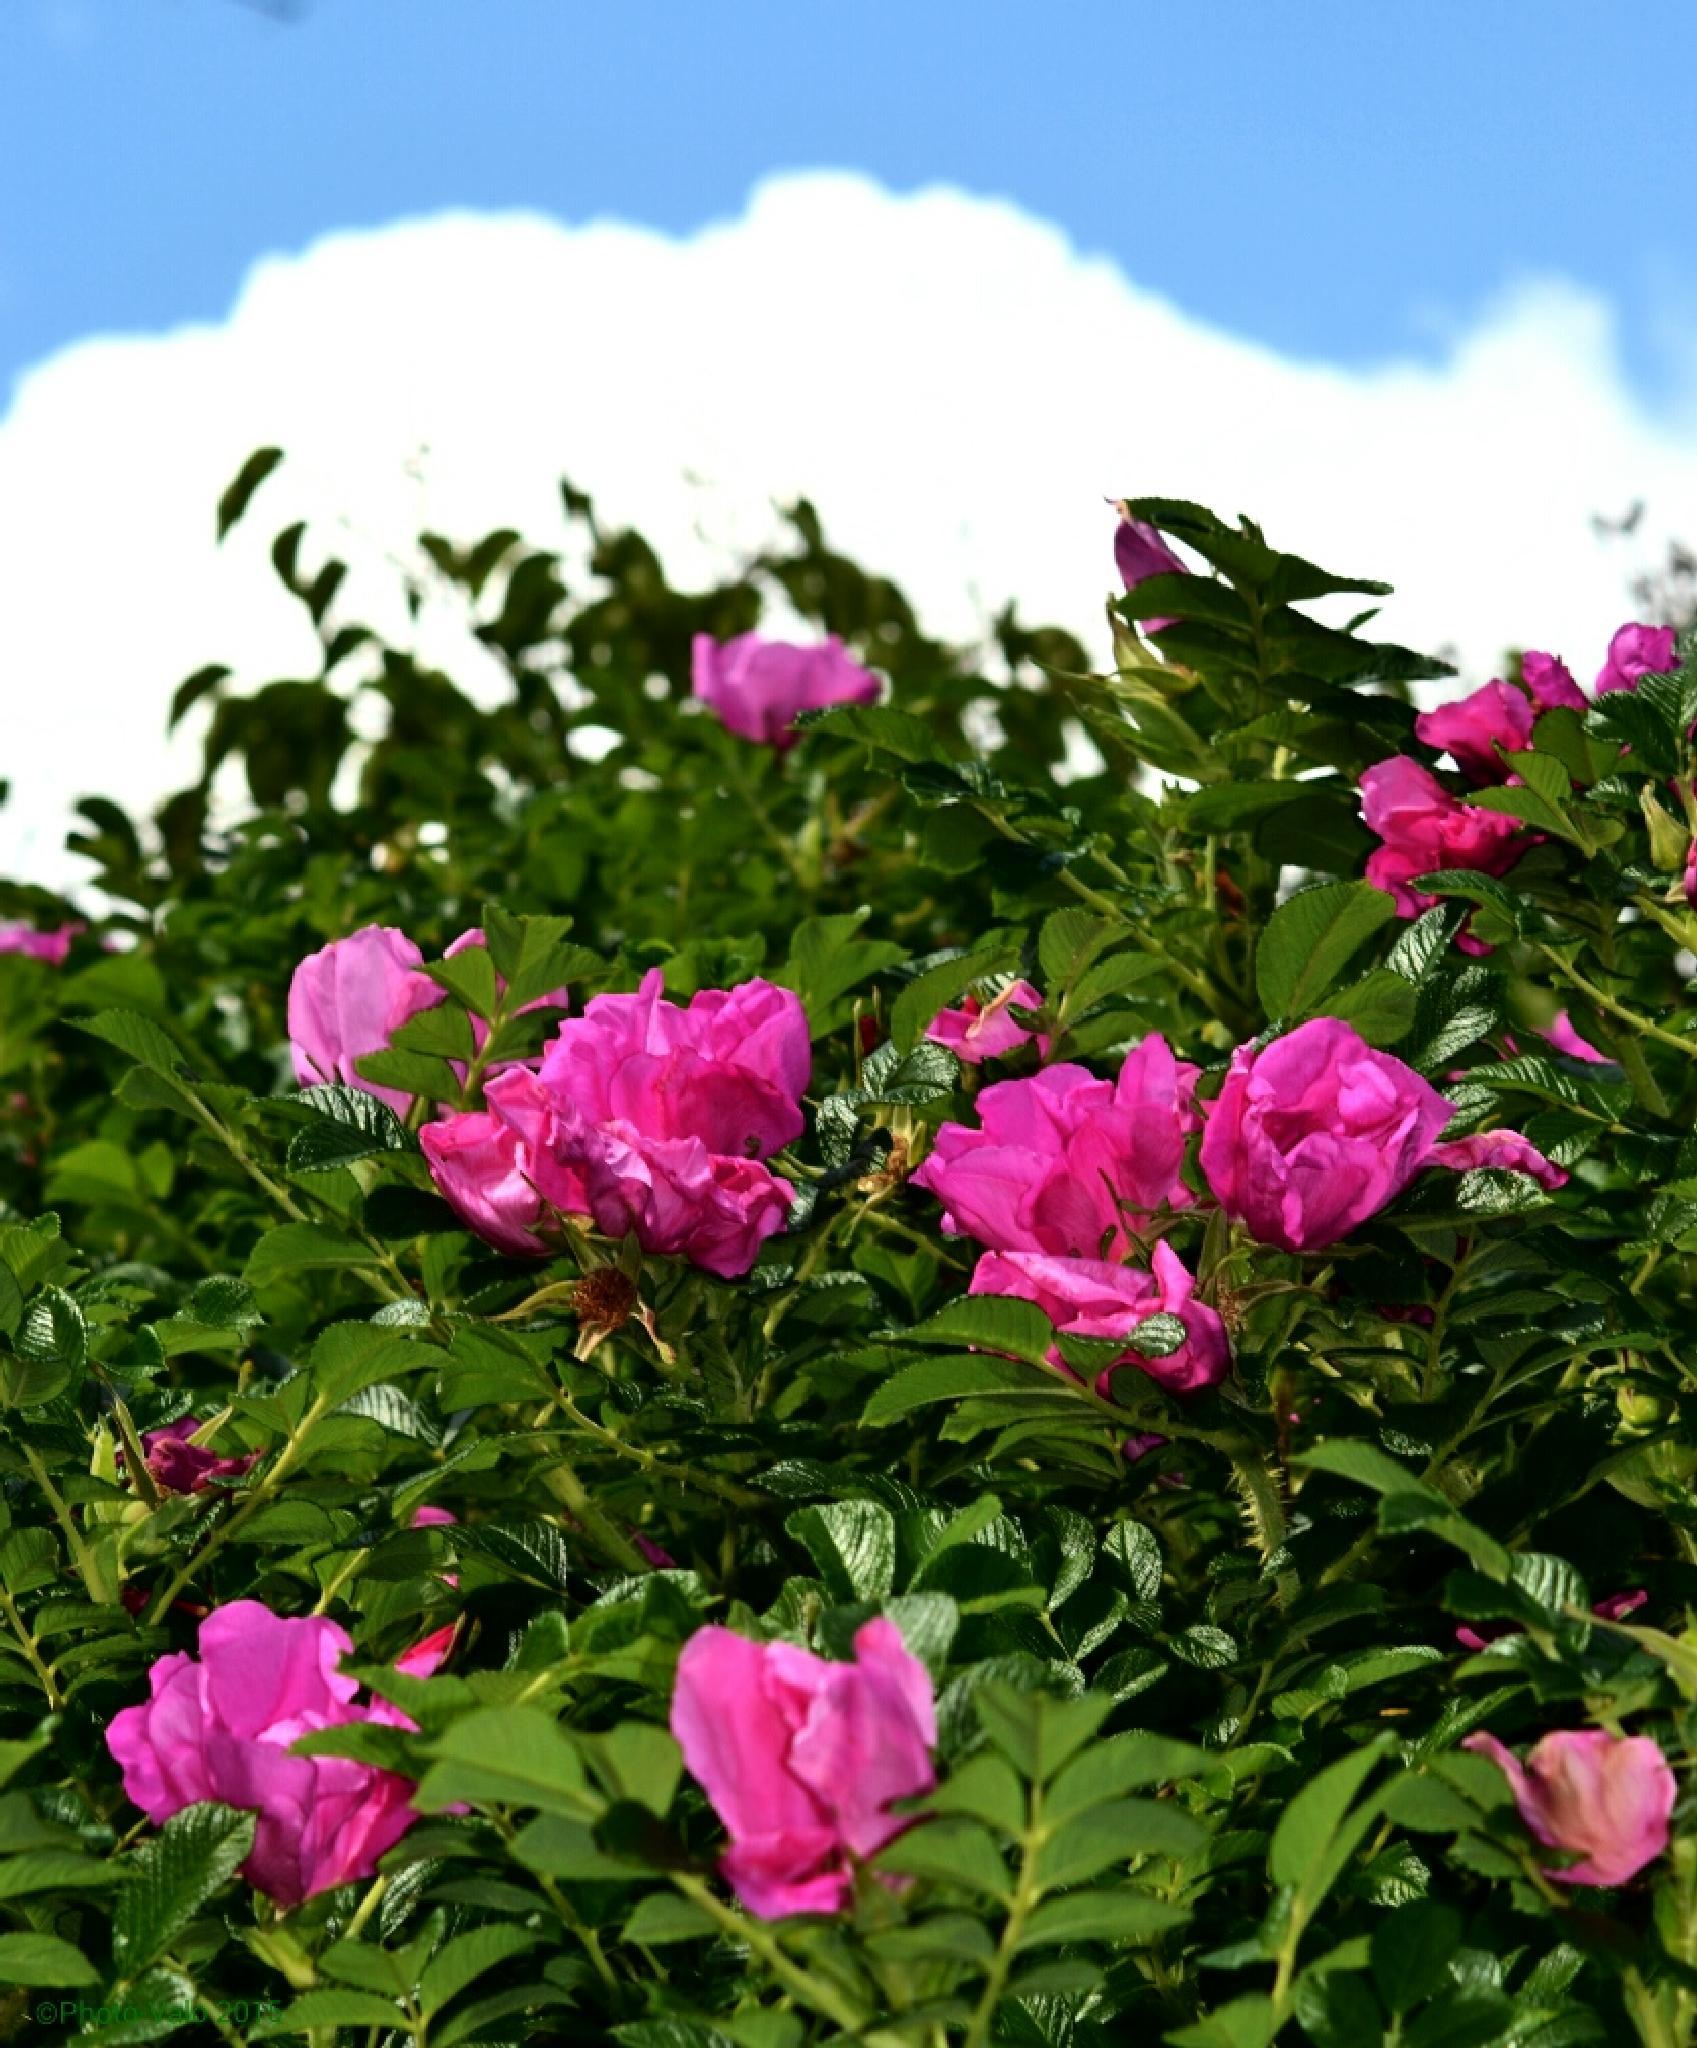 Rose bush by Timo V